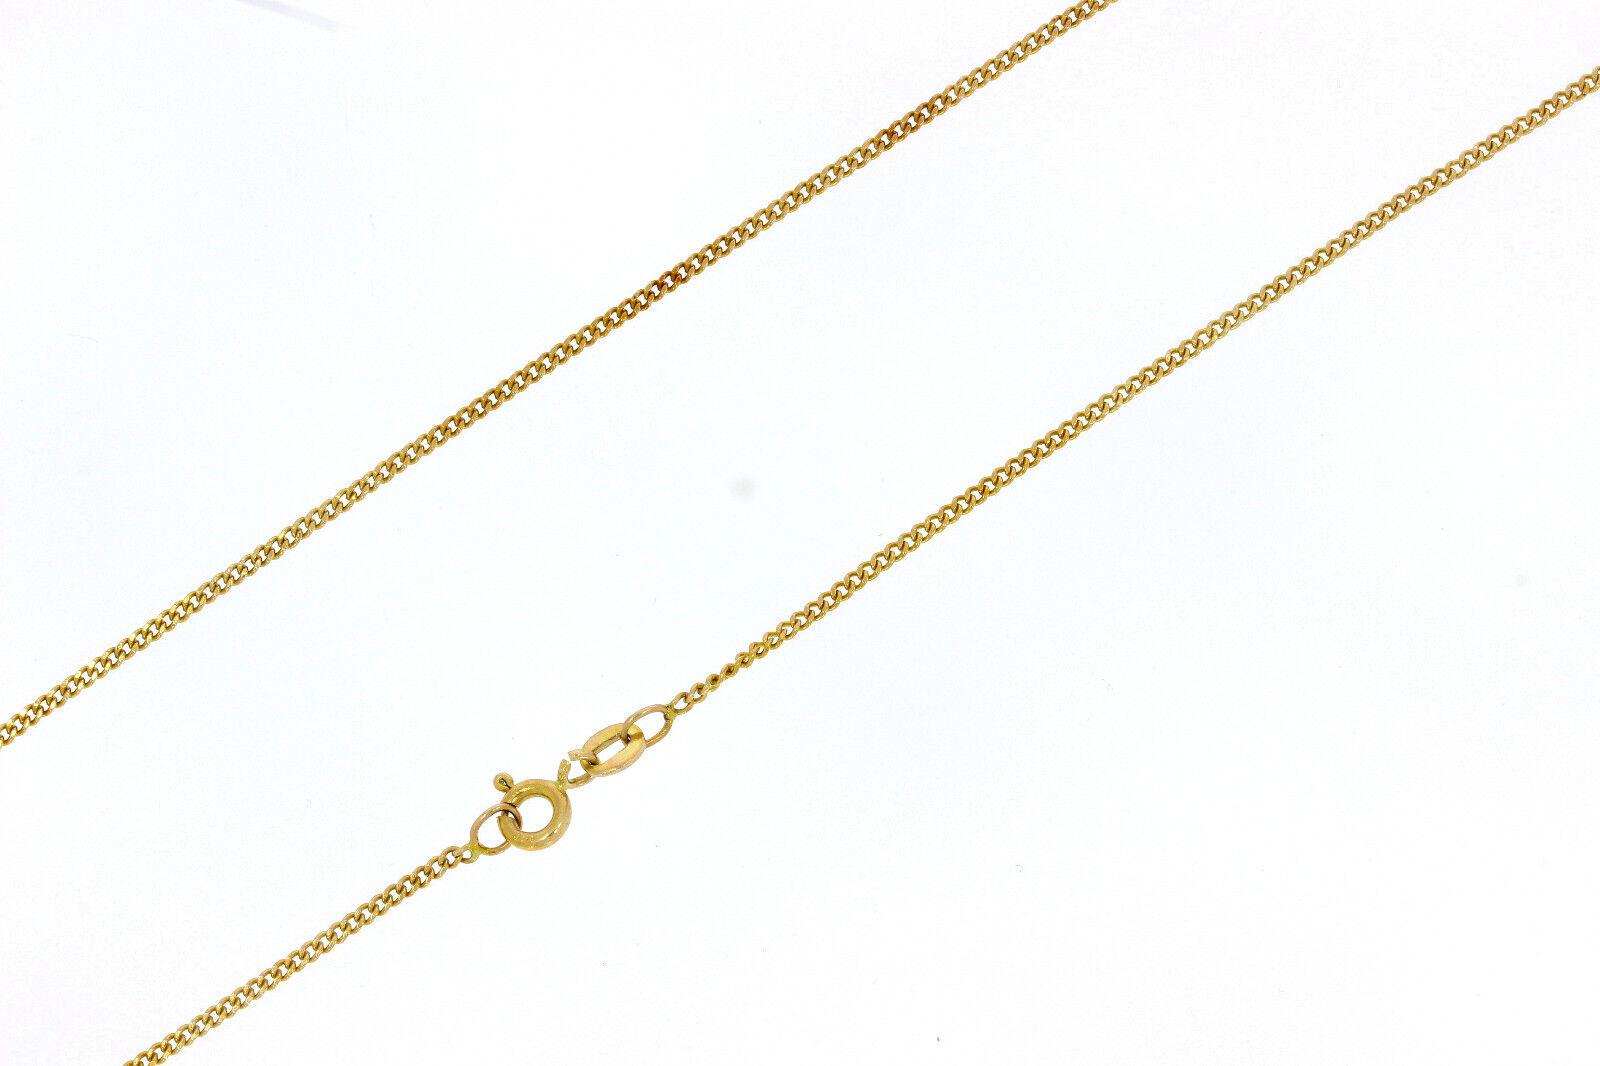 6681-585er yellowgoldkette Lang 38 cm Breit 1,42 Stark 0,75 mm Gewicht 2,6 Gramm